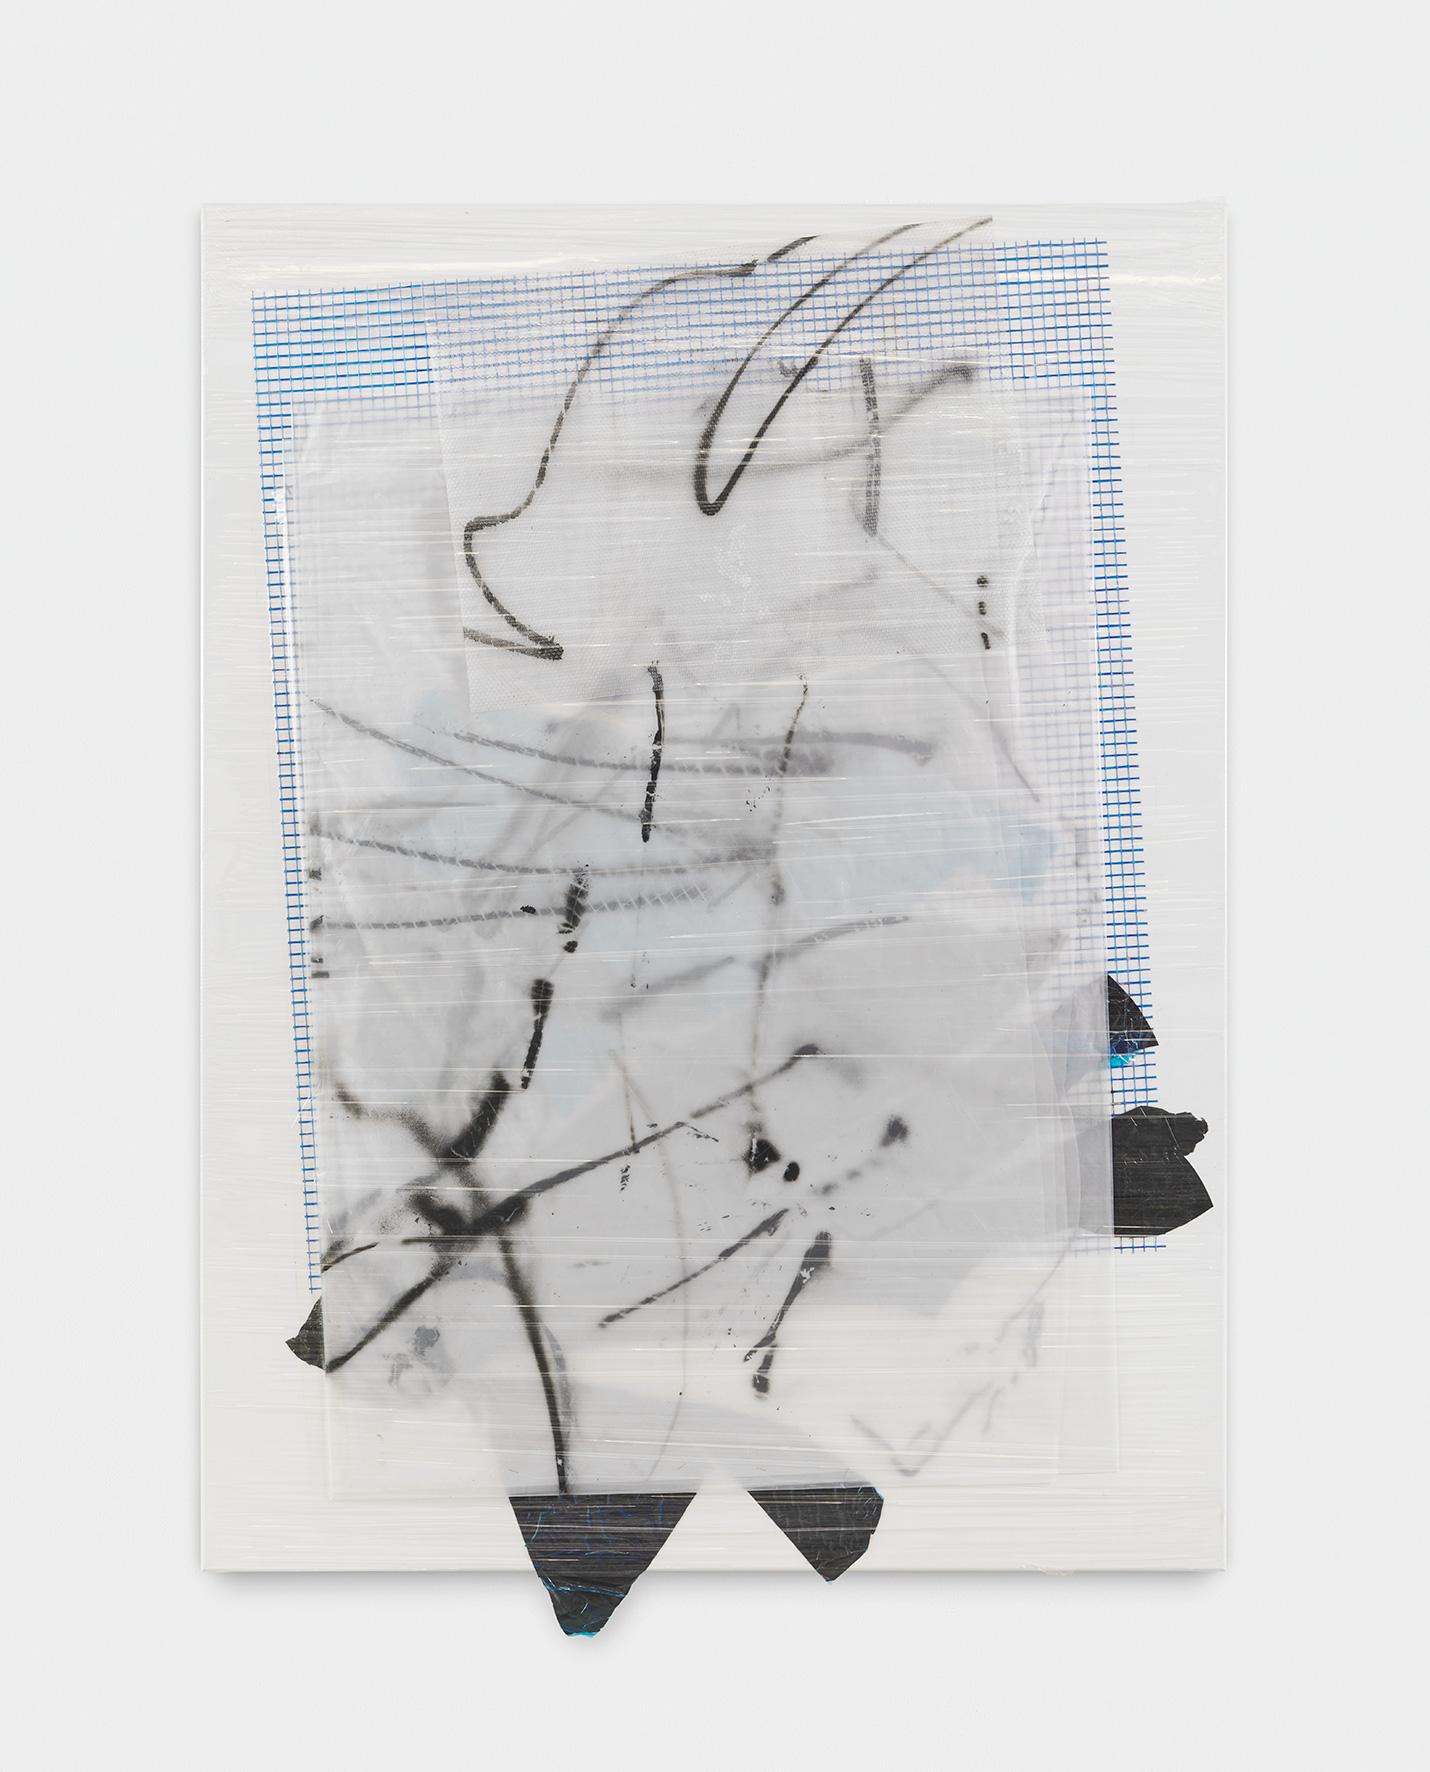 181008 | 2018 | Acryl, Lack, PE Folie, Milchtütenkarton recycled auf Leinwand | 165 x 120 cm | ©GALERIE ALBER